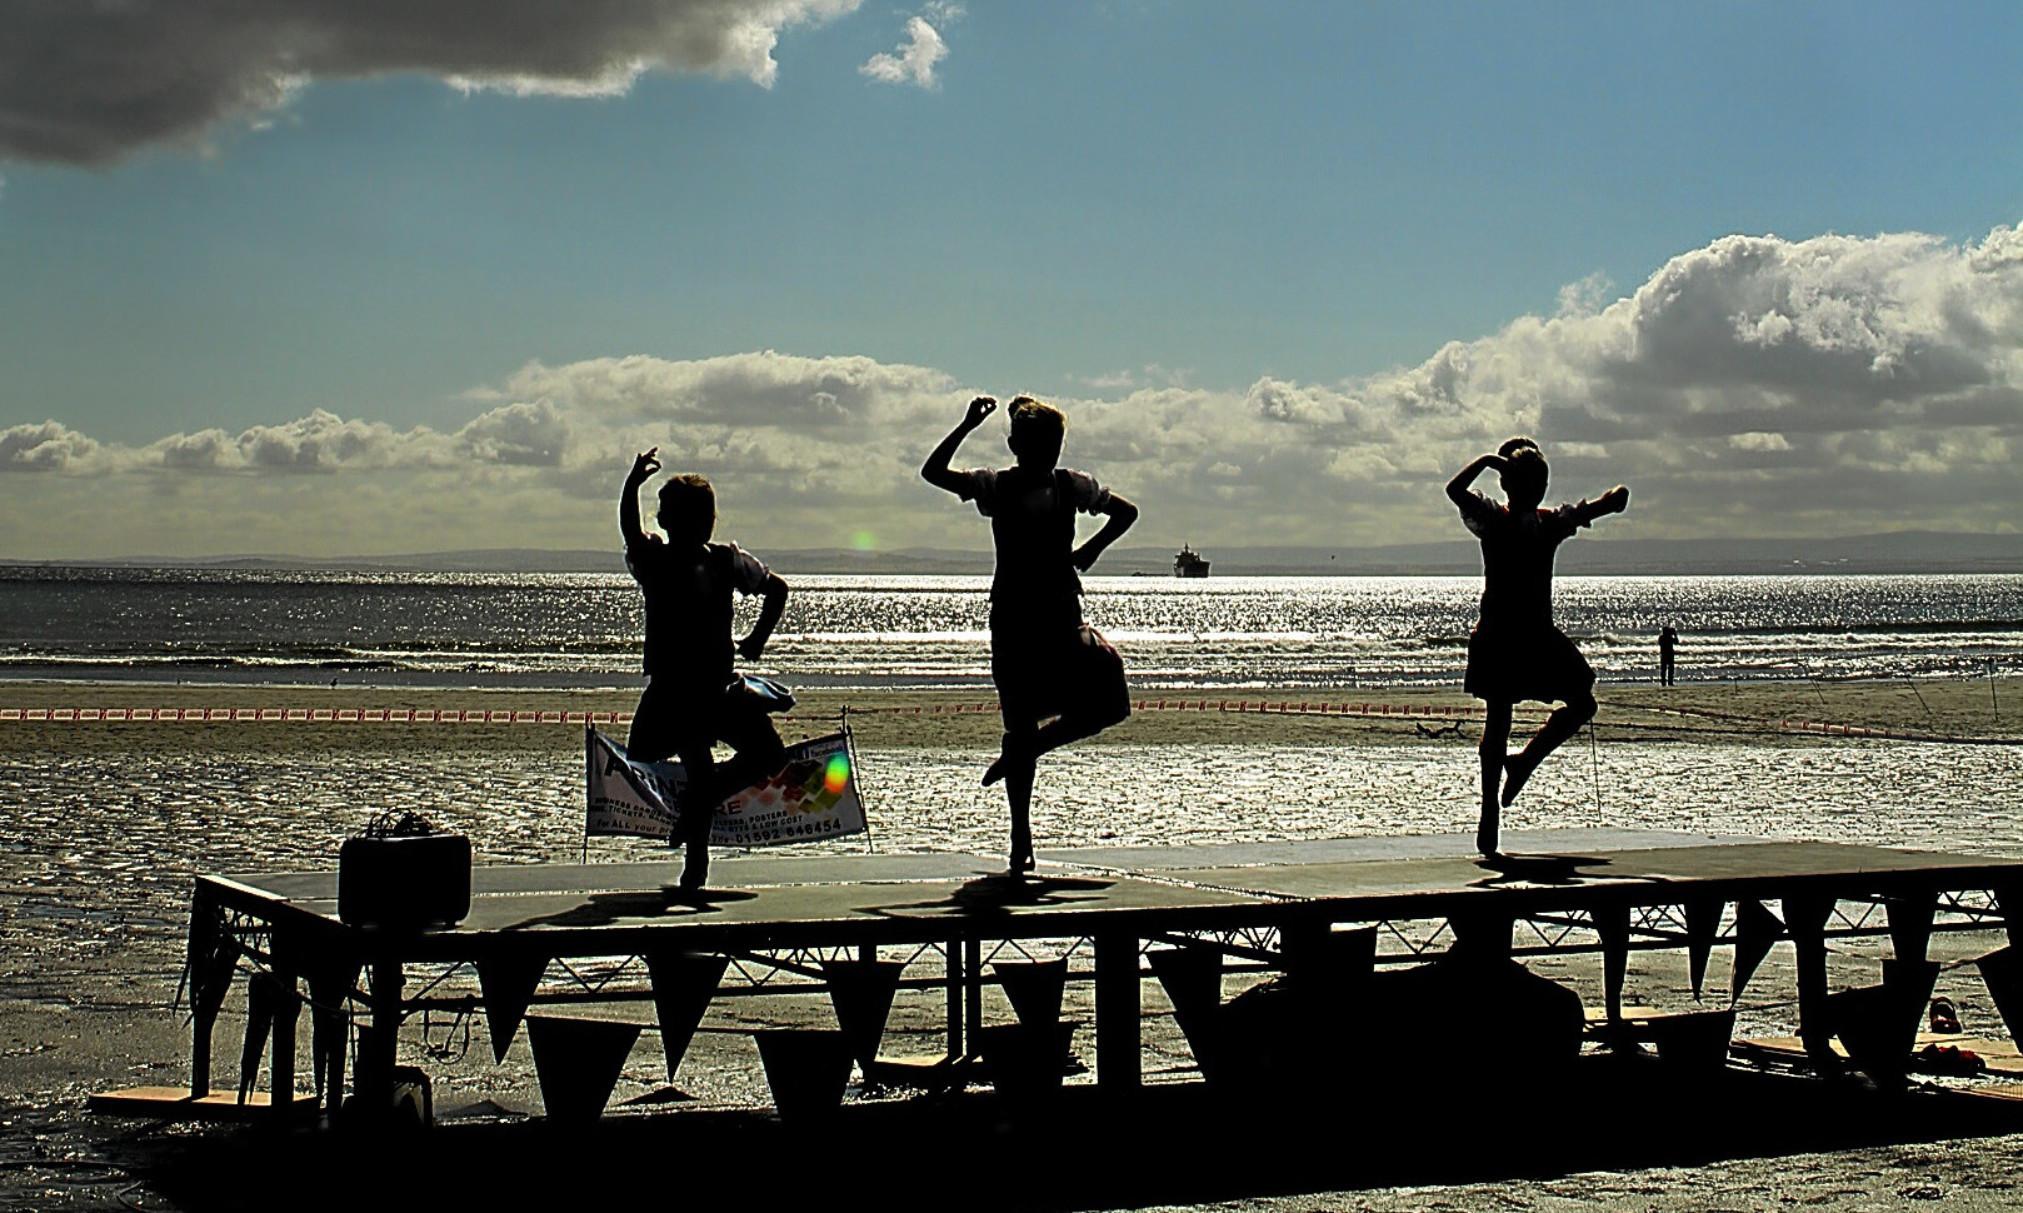 Dancers at a previous Kirkcaldy Beach Highland Games.